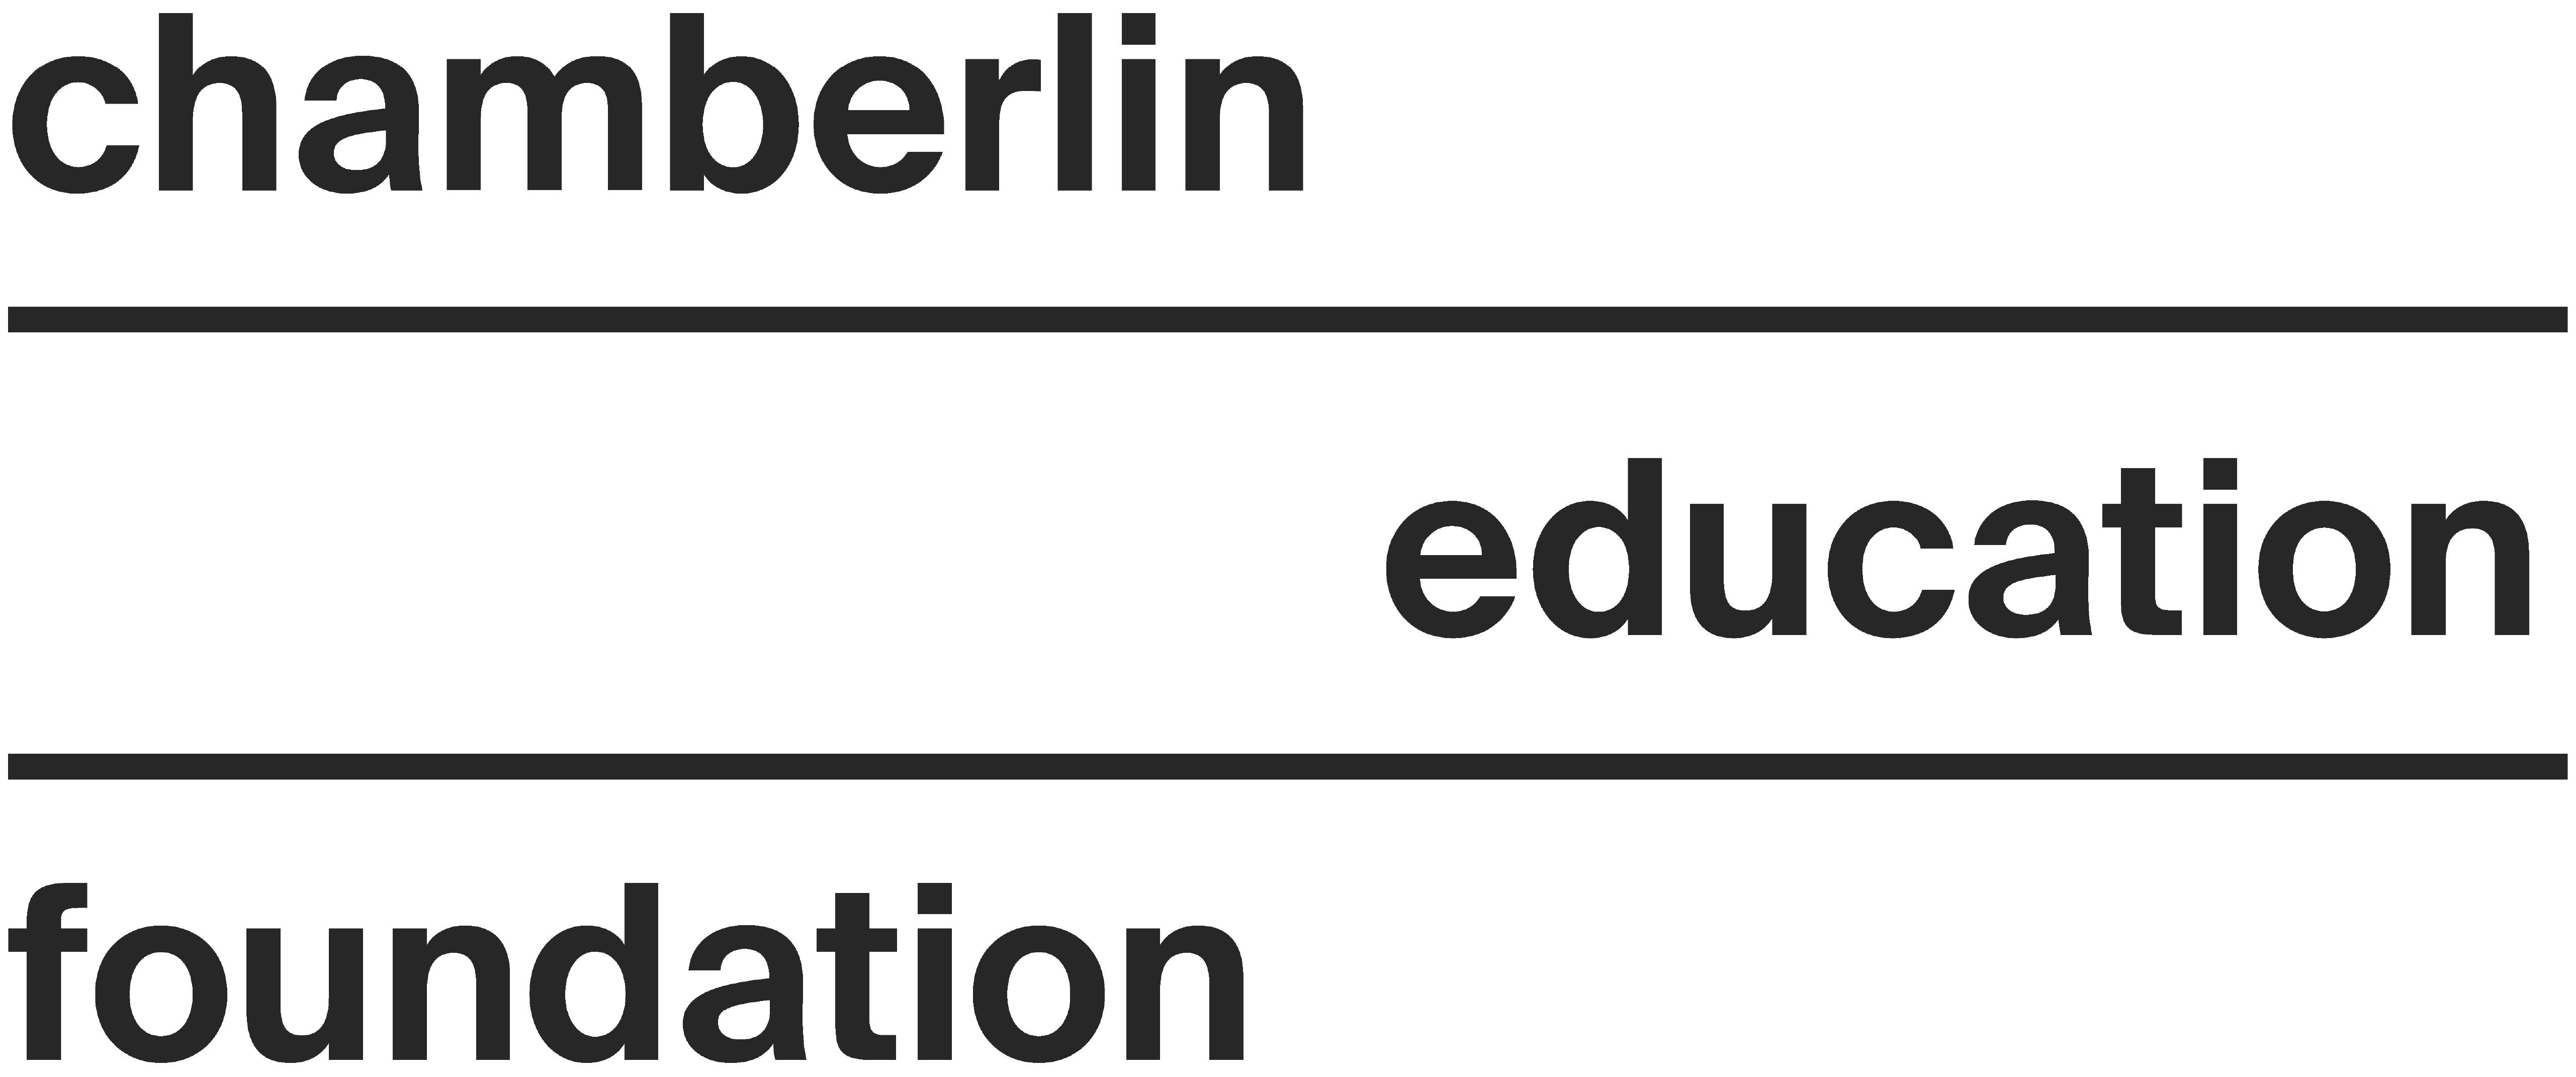 Chamberlin Foundation